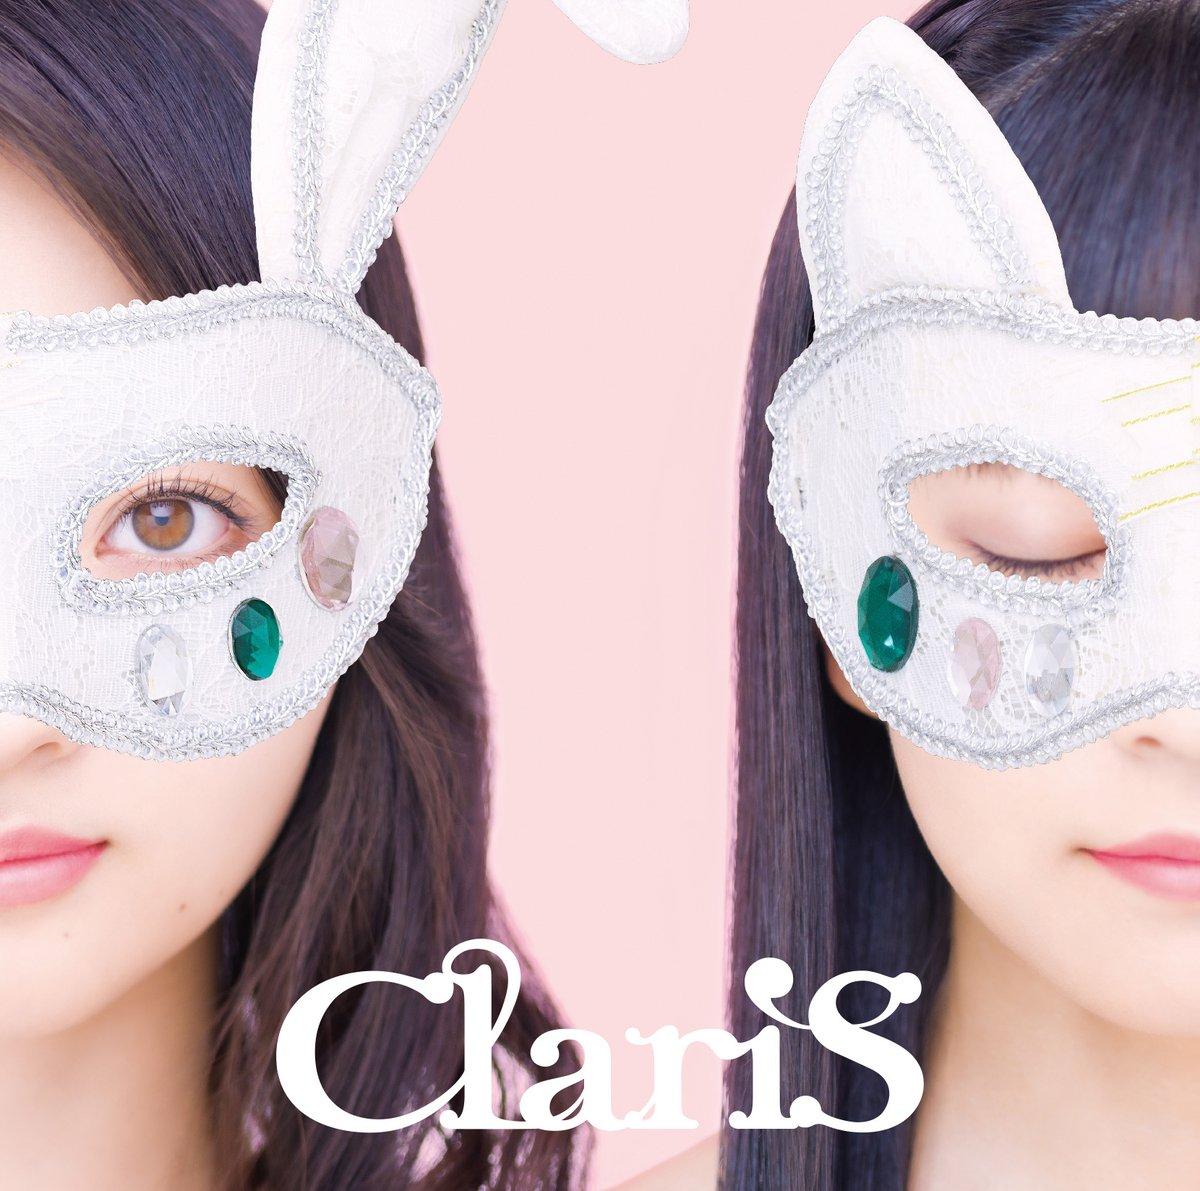 『ClariS - 仮面ジュブナイル 歌詞』収録の『ClariS 10th Anniversary BEST Pink Moon』ジャケット